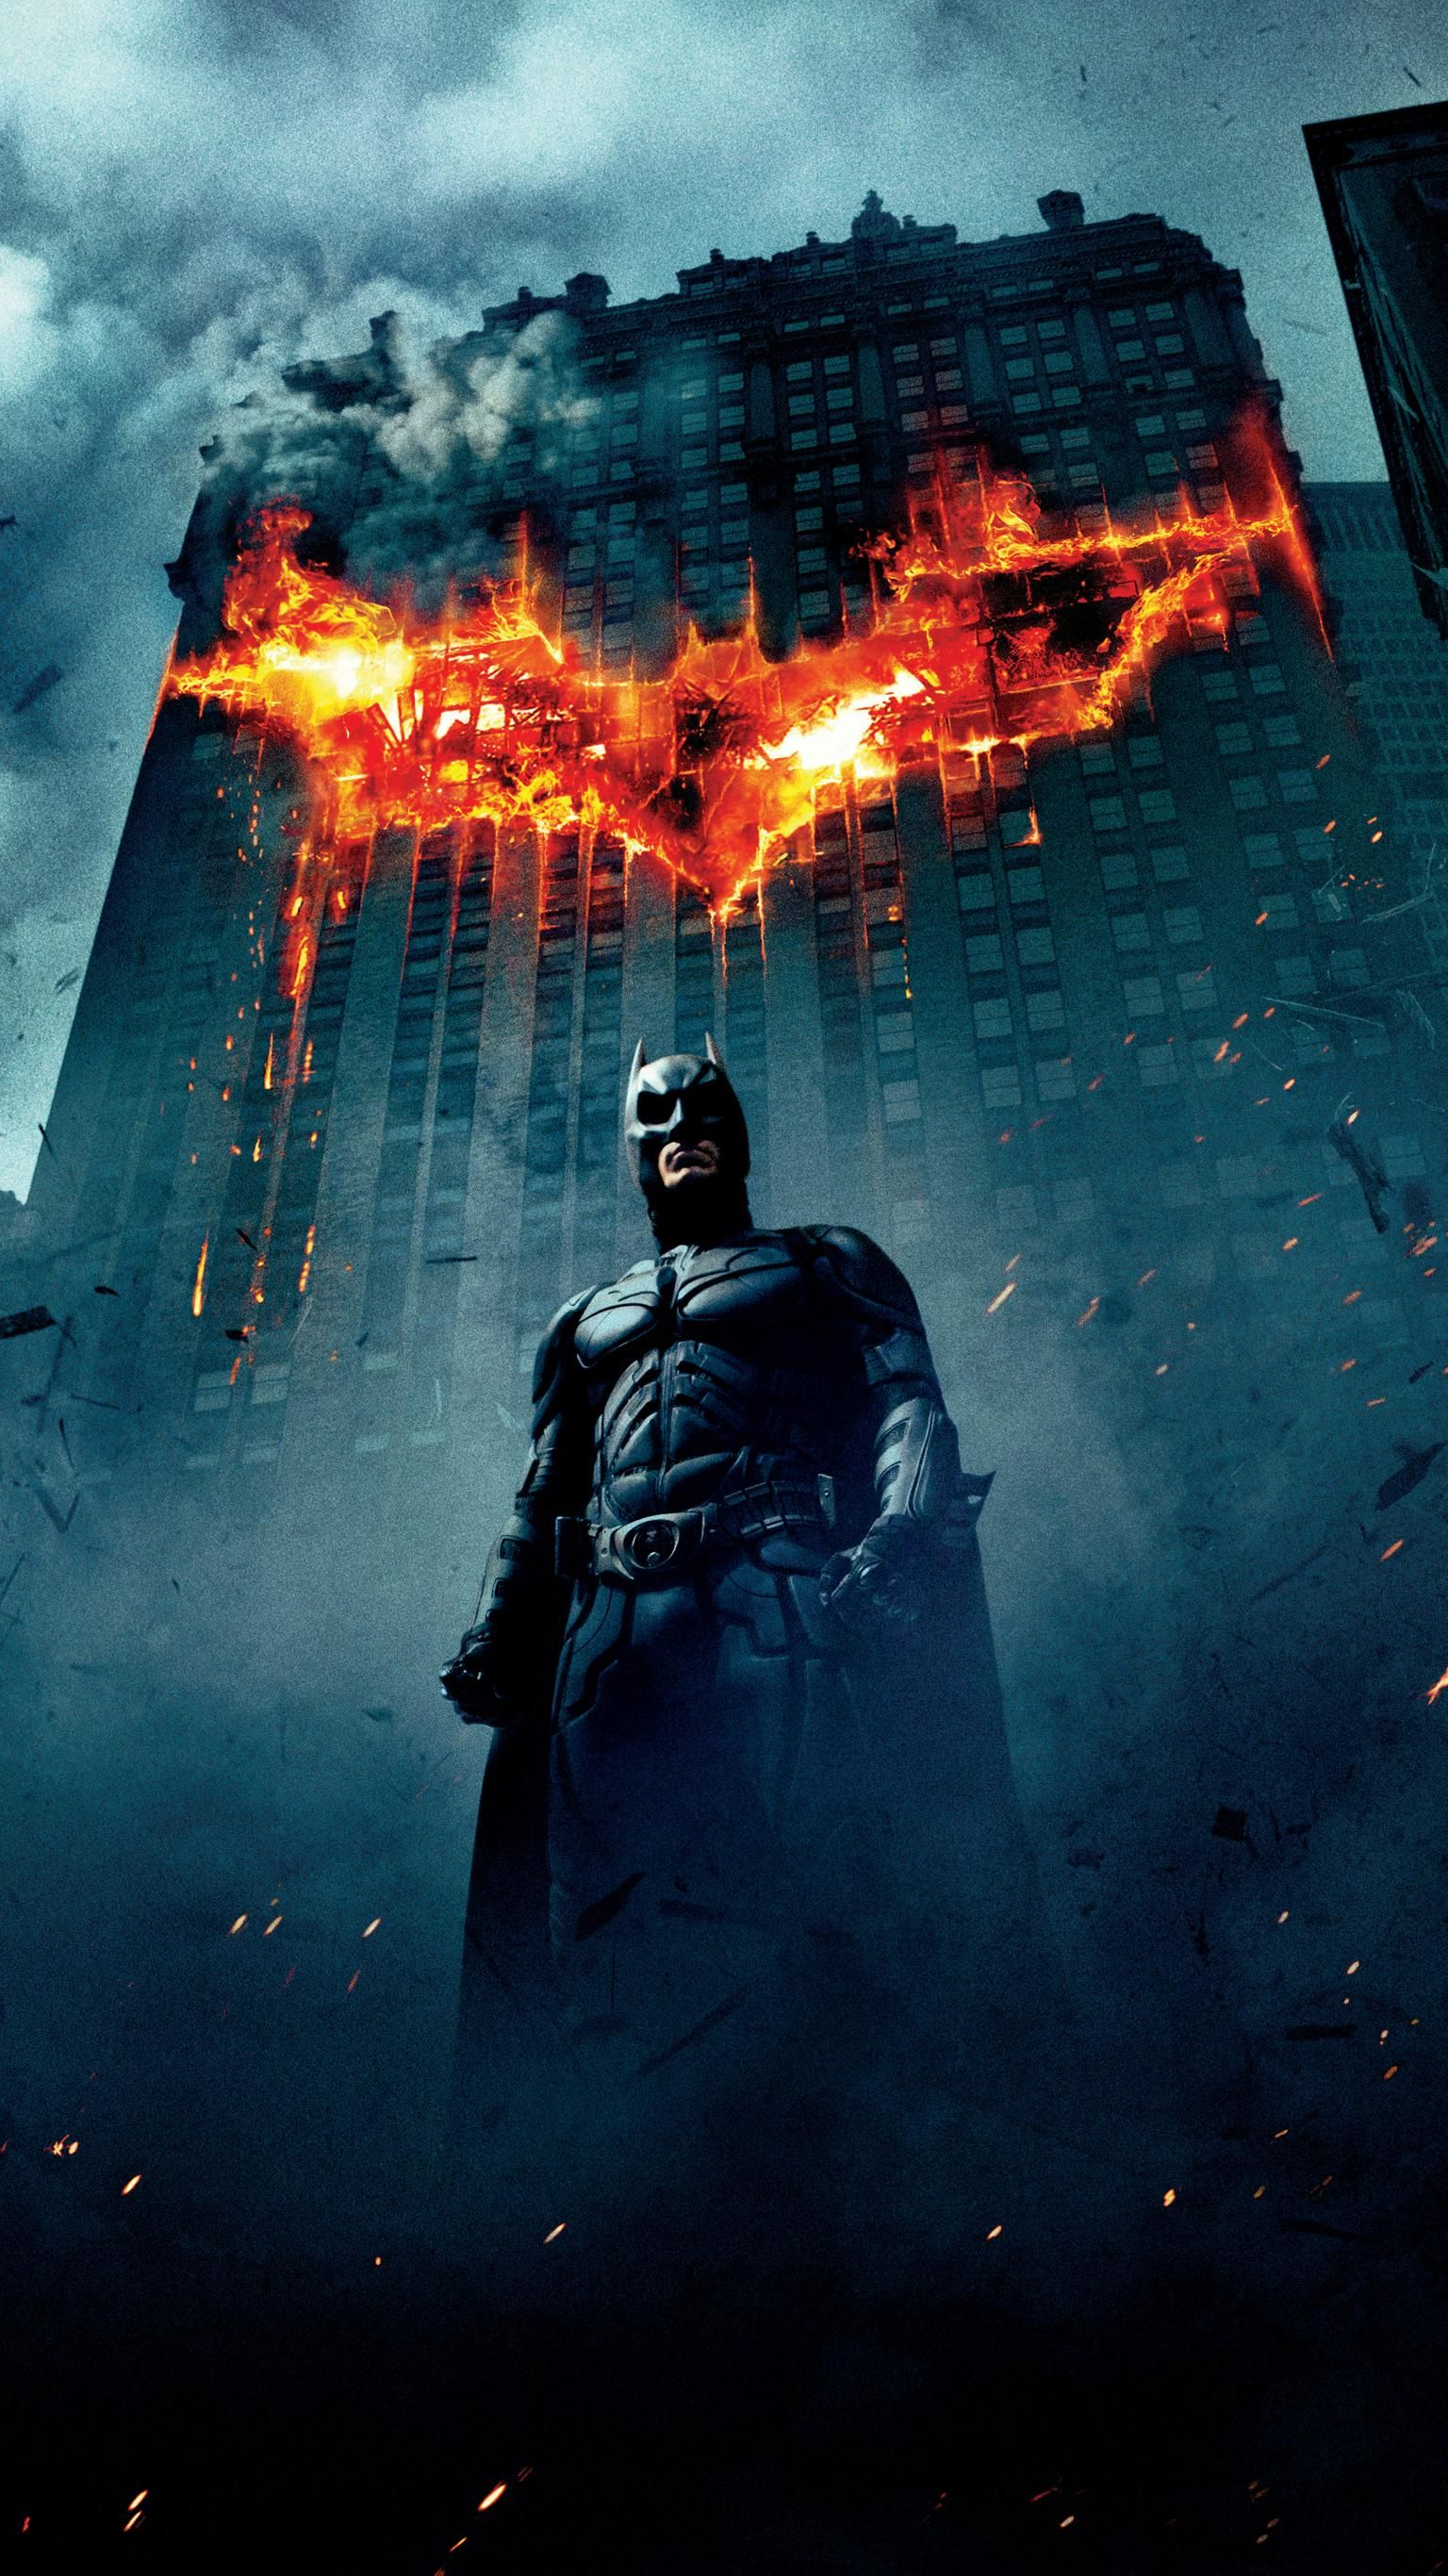 The Dark Knight 2008 Phone Wallpaper Moviemania Dark Knight Wallpaper The Dark Knight Poster The Dark Knight Trilogy